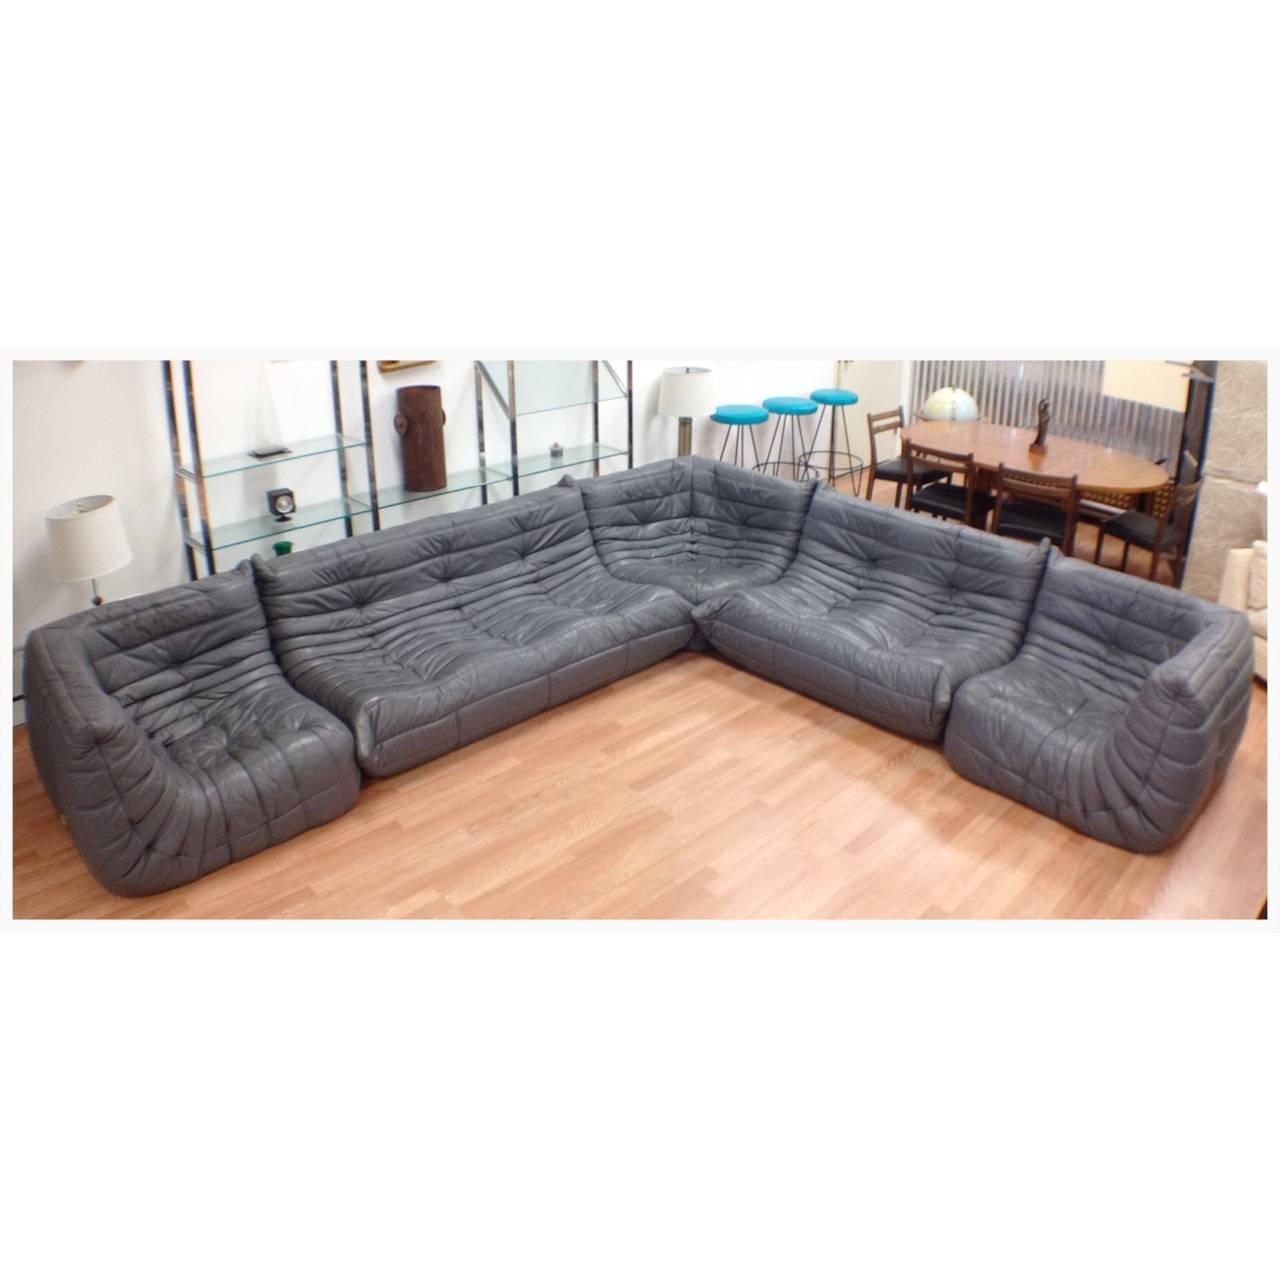 togo sofa price hughes furniture serta exceptional five piece gray leather ligne roset